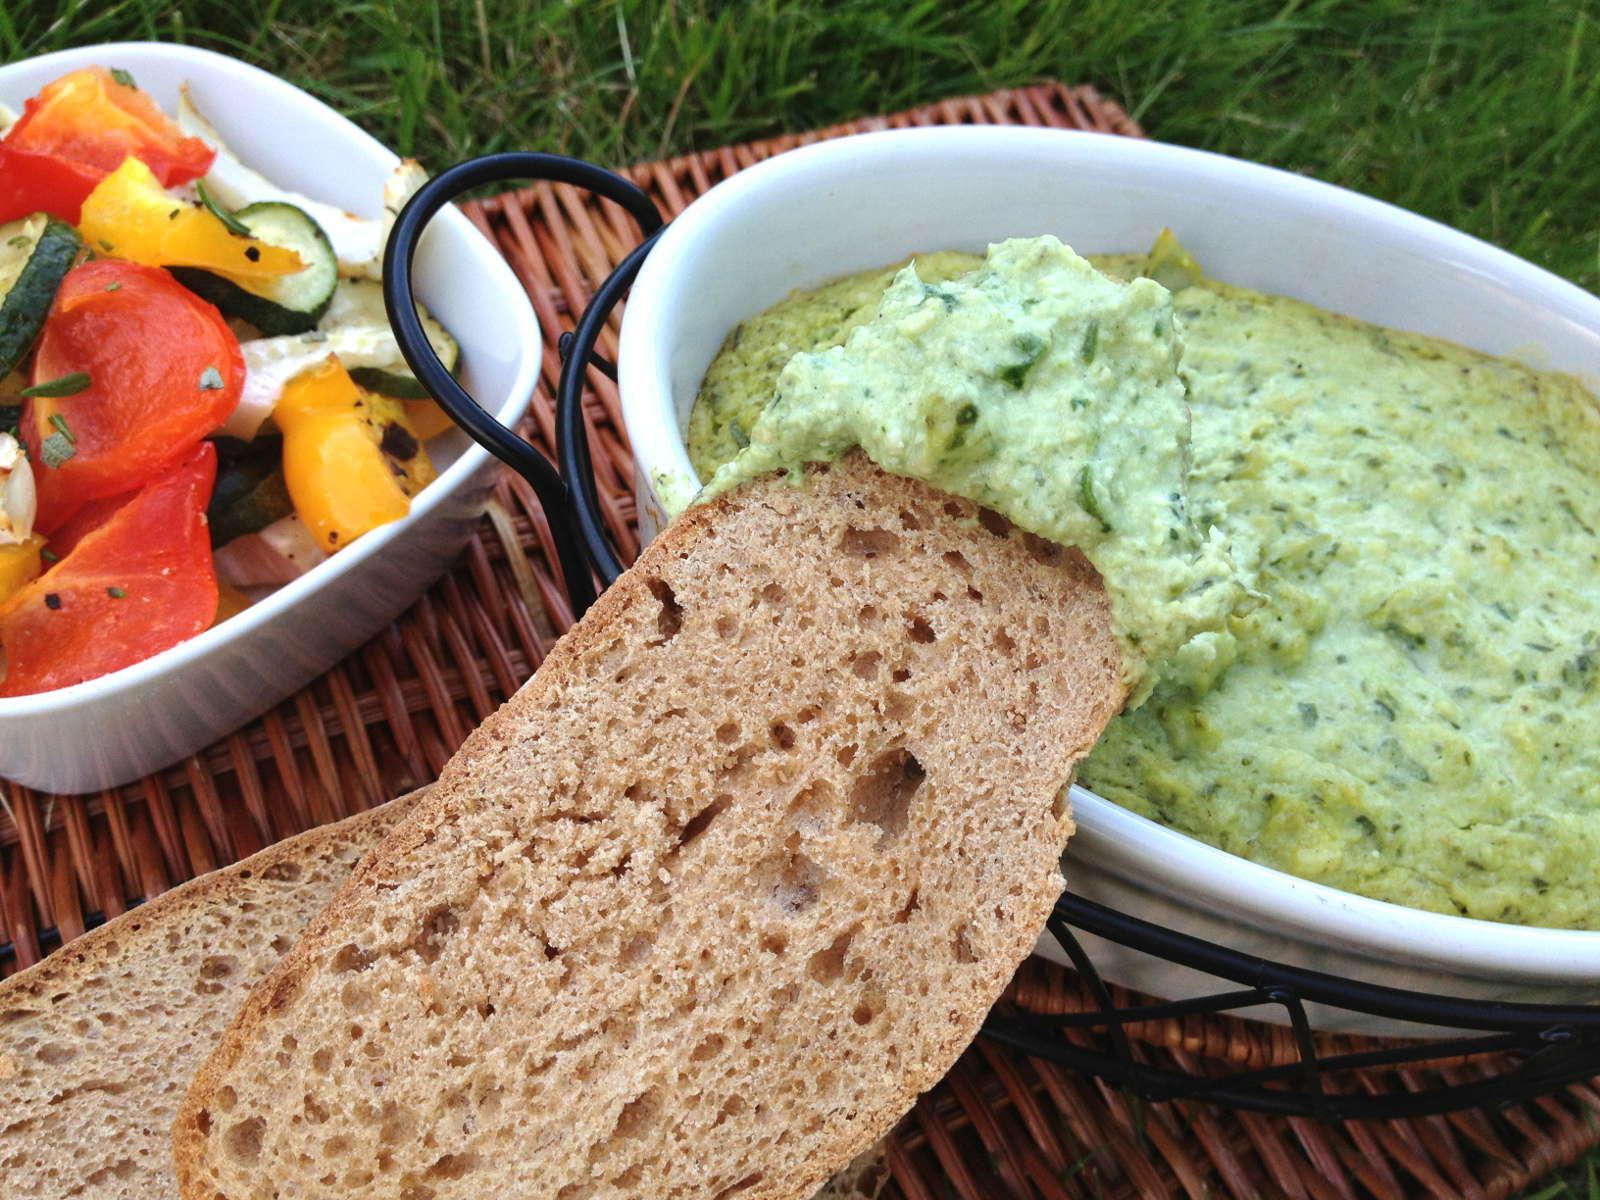 Creamy Vegan Artichoke Spinach Dip